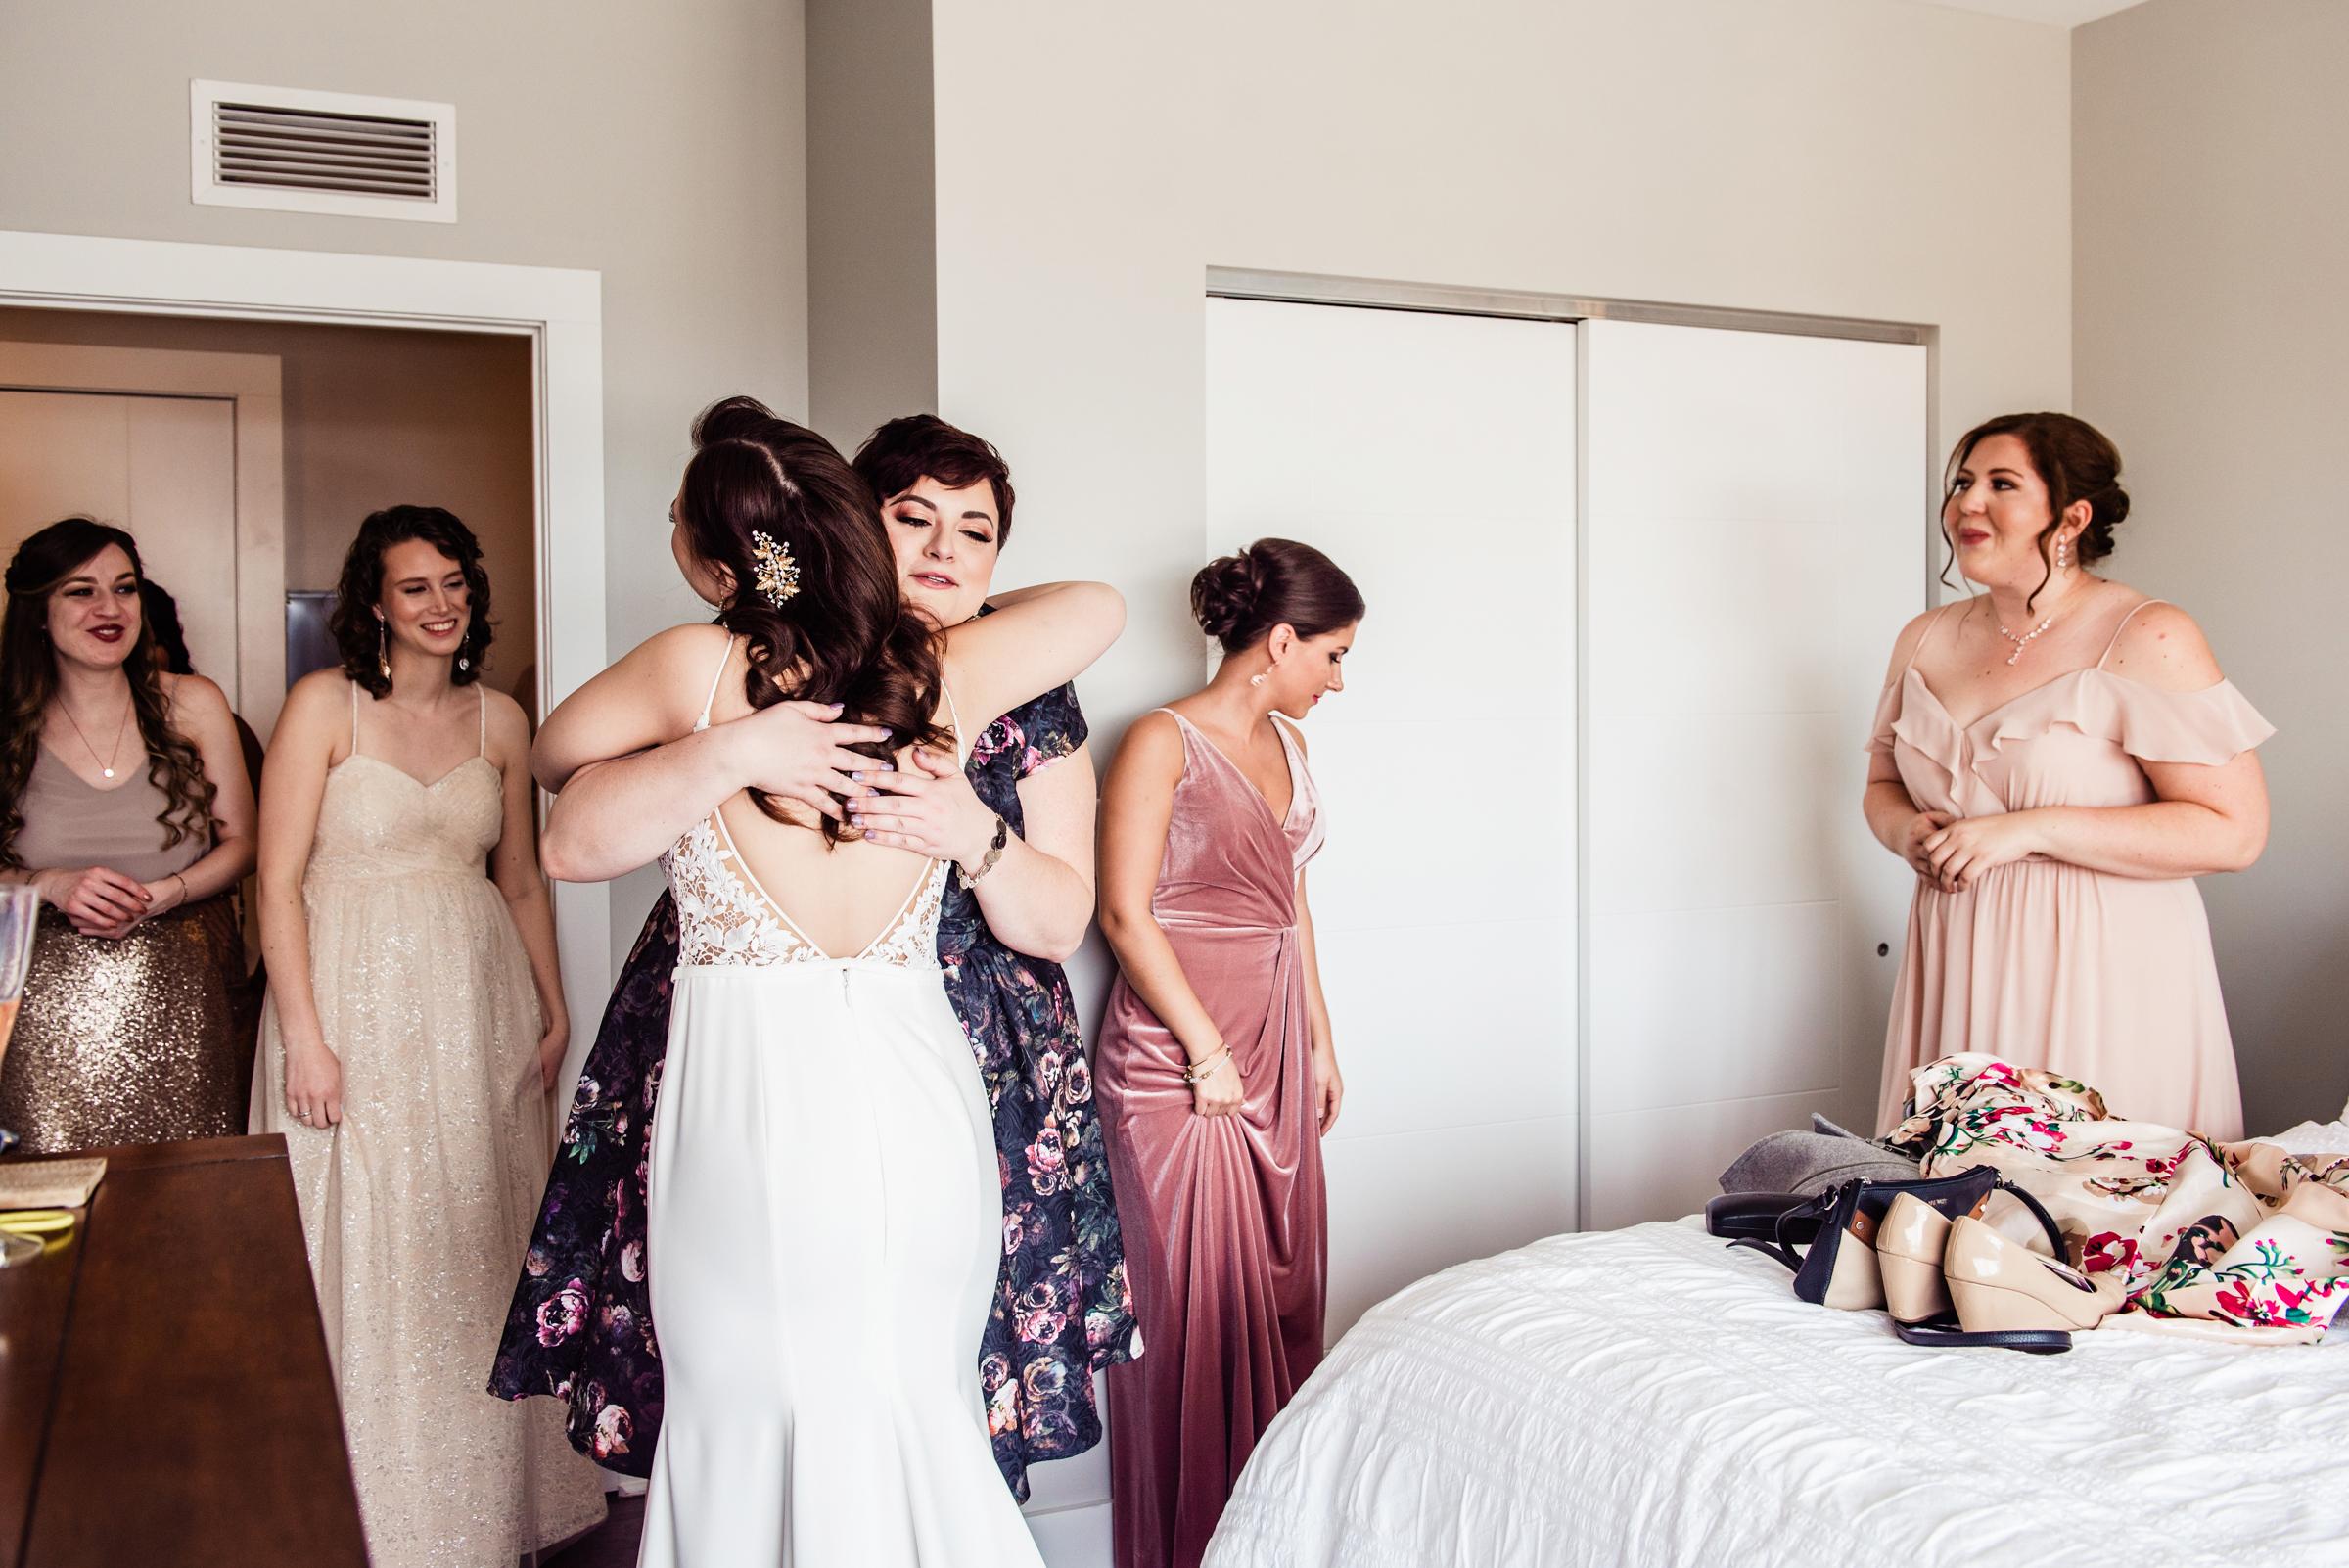 The_Arbor_LoftRochester_Wedding_JILL_STUDIO_Rochester_NY_Photographer_141127.jpg